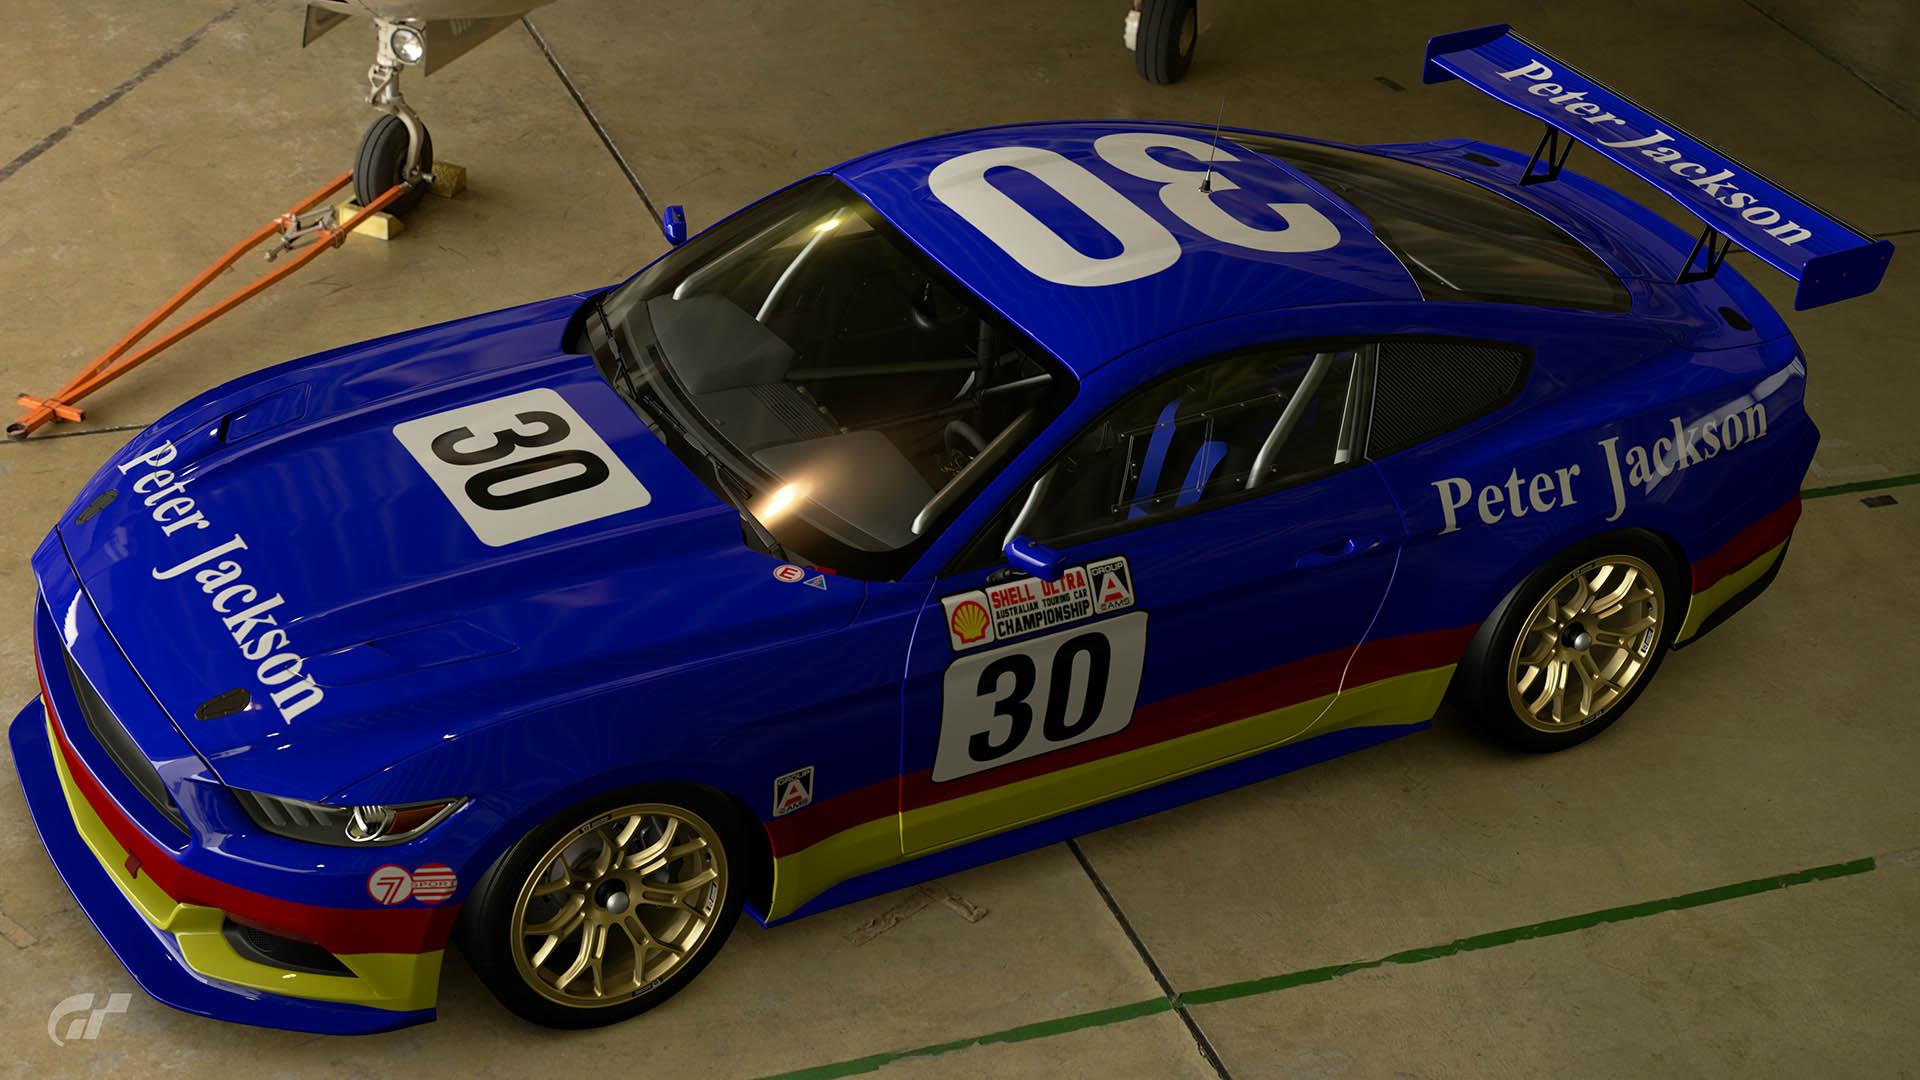 Glenn Seton Peter Jackson Racing 1989 ATCC Ford Mustang